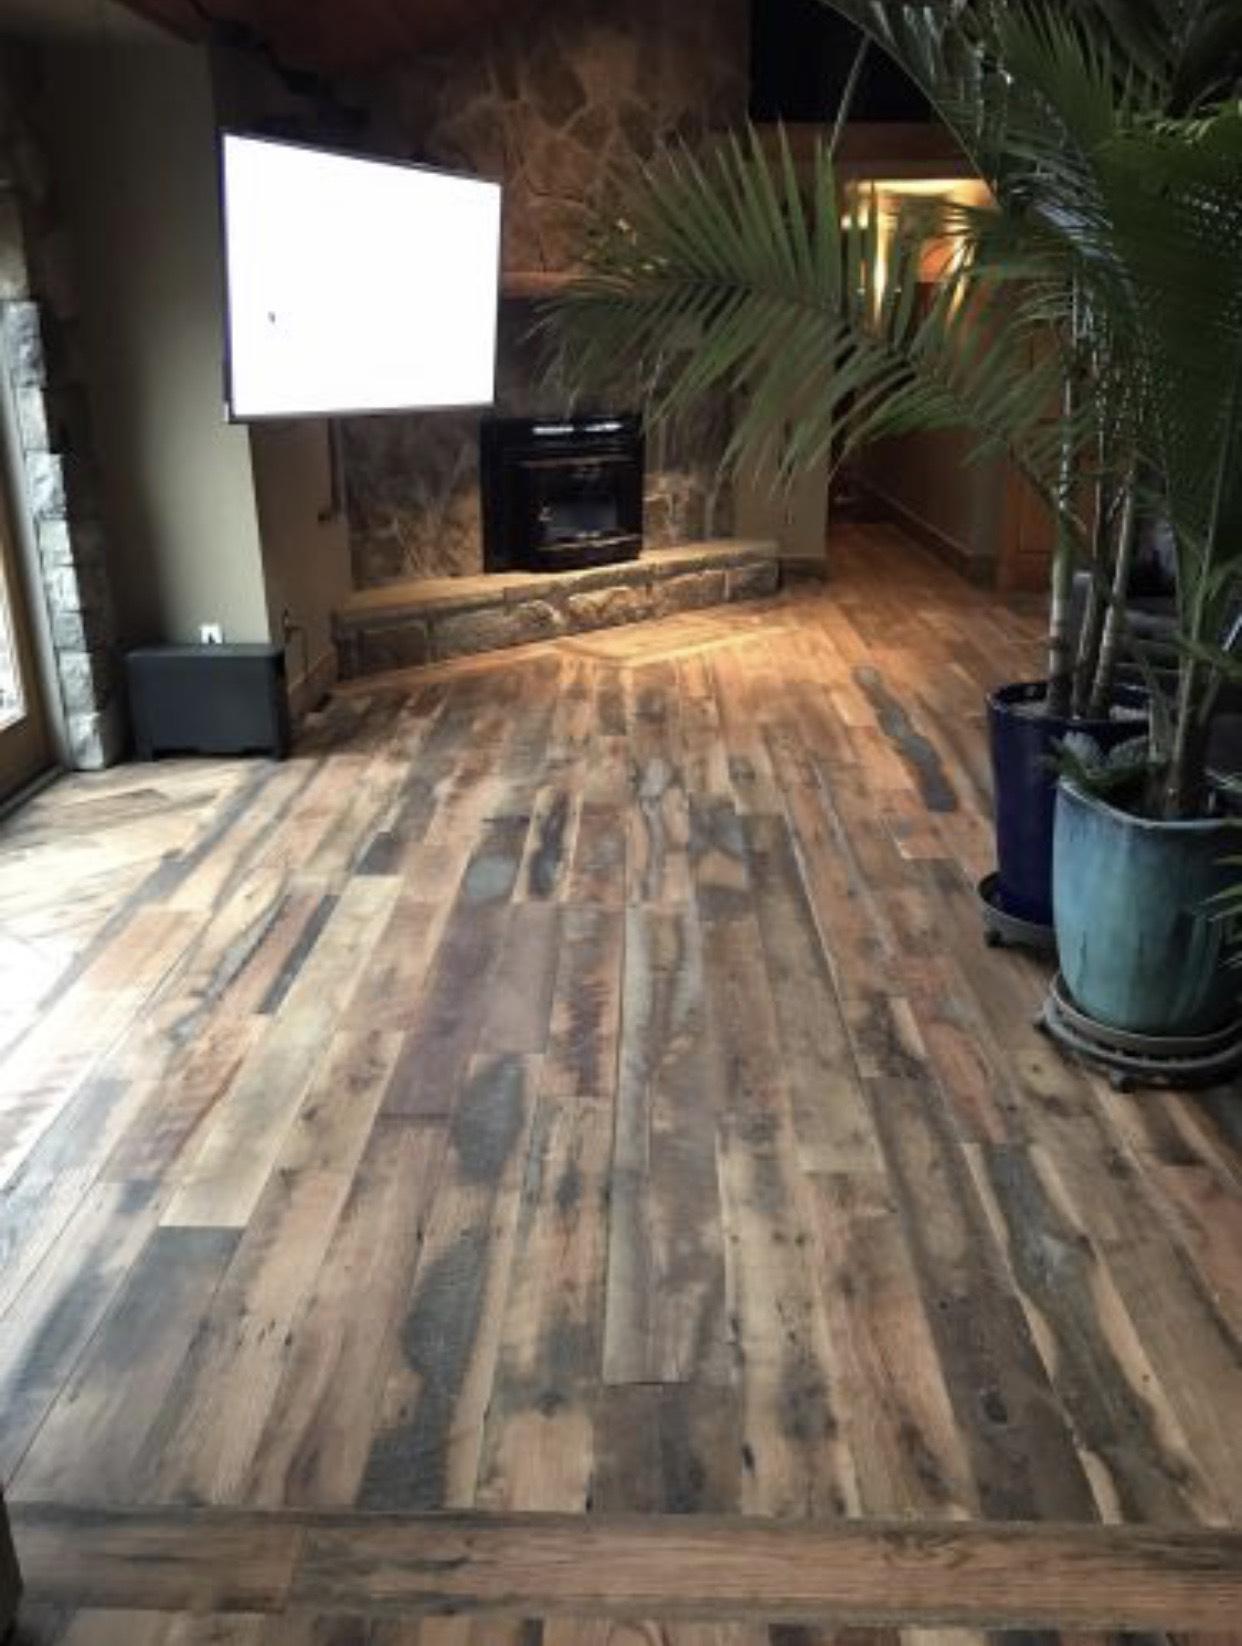 Floor Tiles 15123 D J Hardwood Flooring, Laminate Flooring Pittsburgh